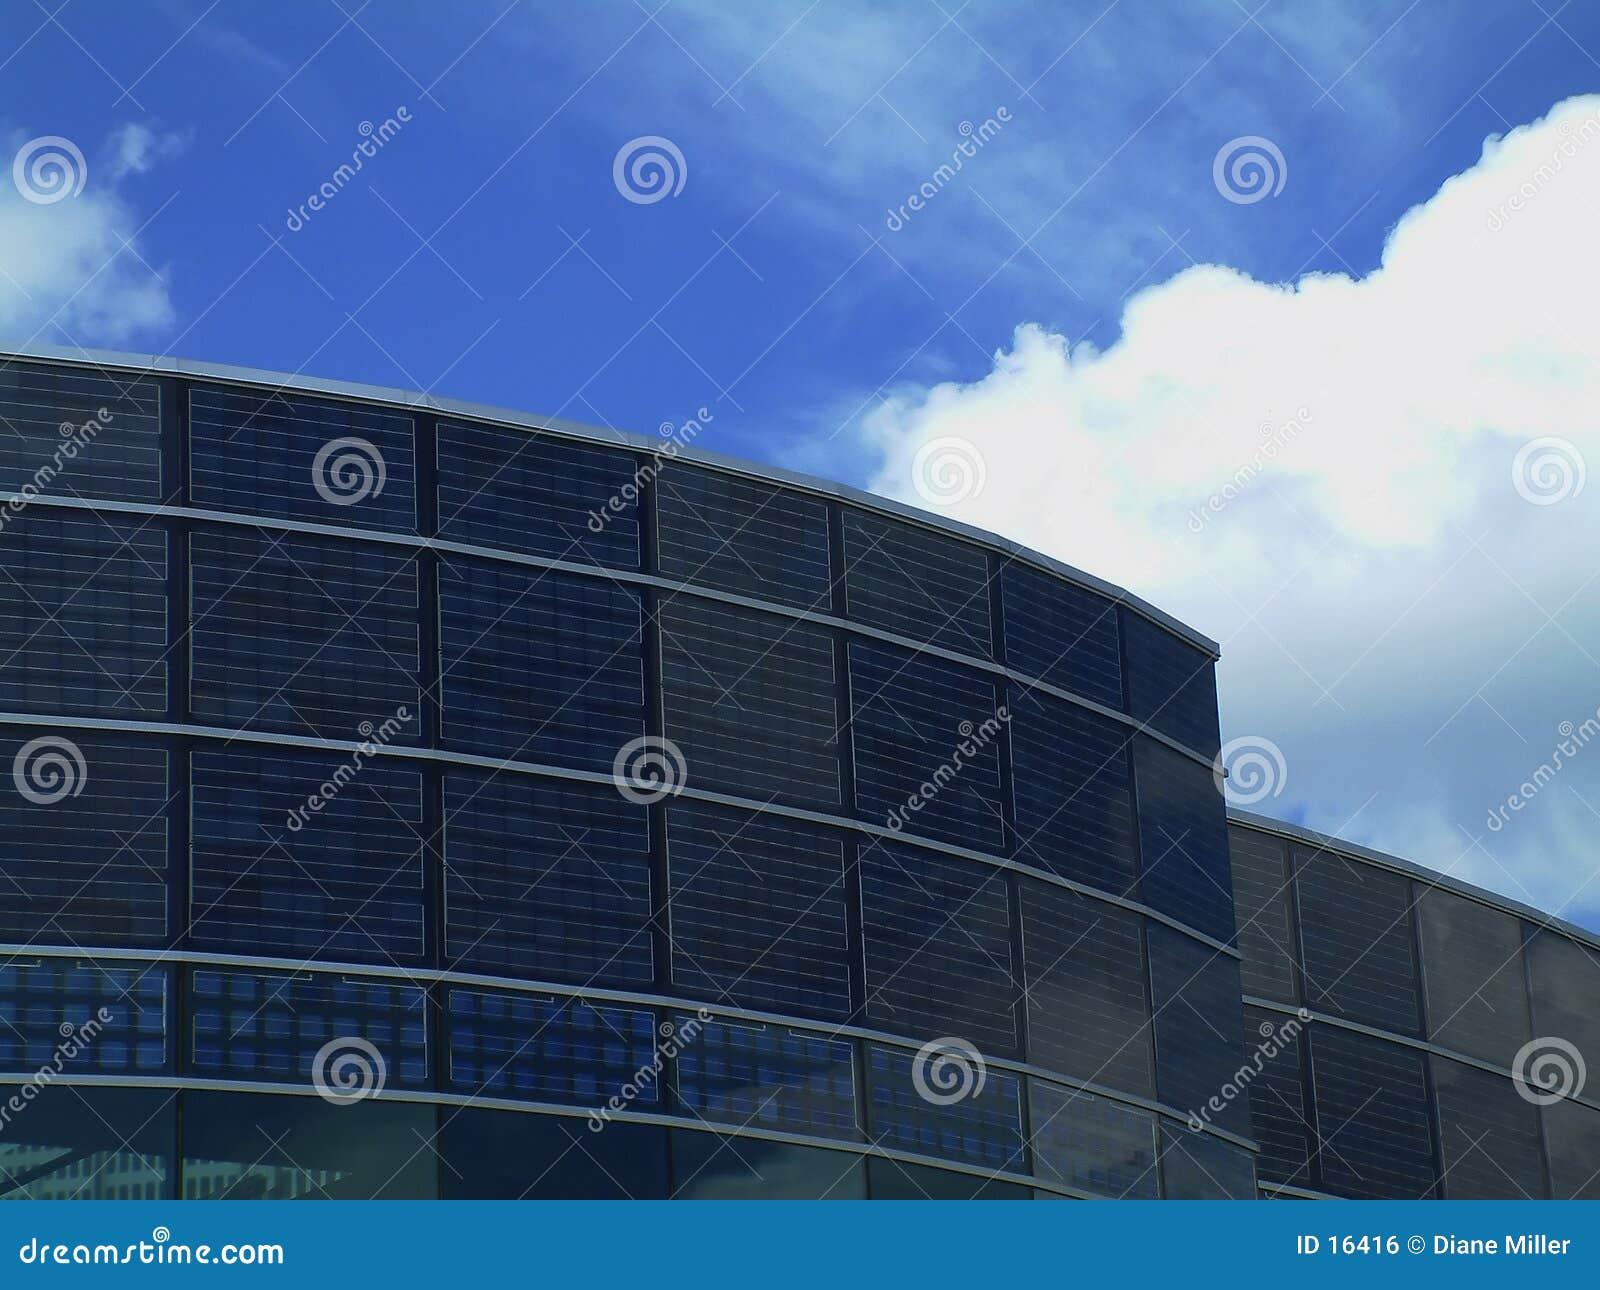 Solar building with blue sky